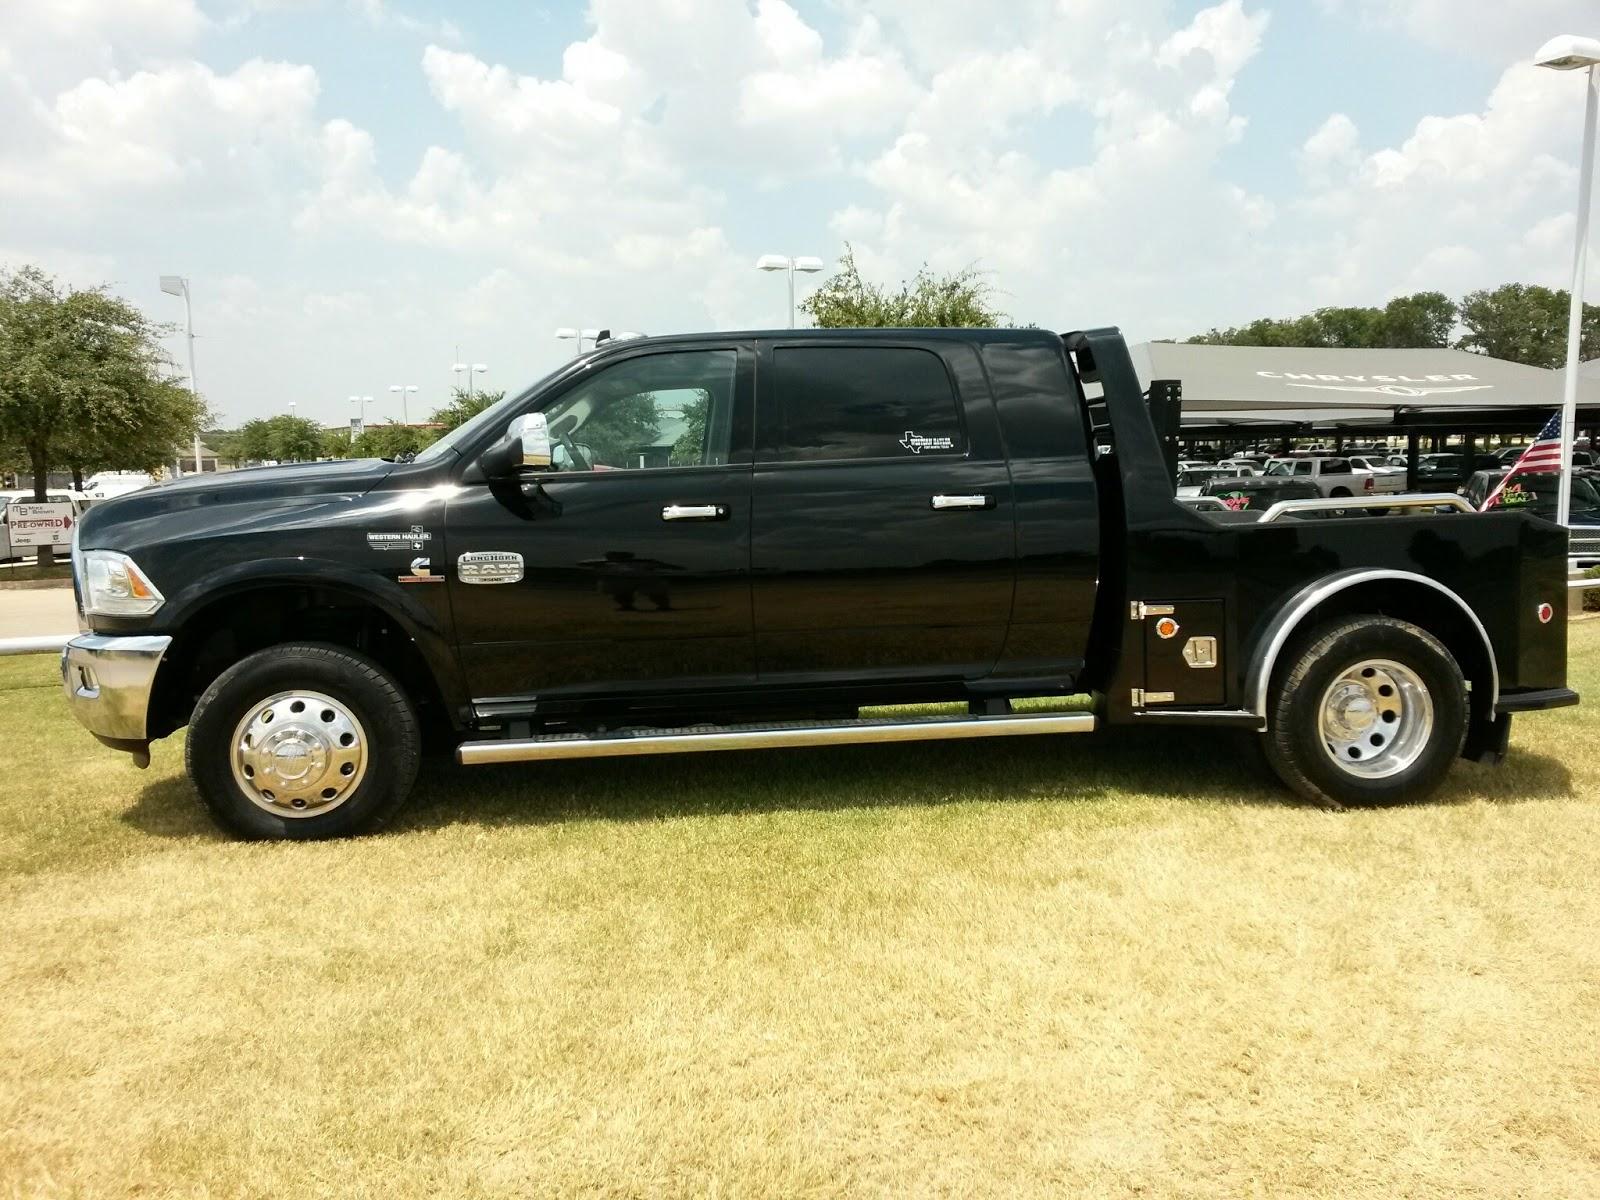 Used Cars Dfw >> New Black 2015 Ram 3500 Laramie Longhorn Mega Cab 4x4 ...